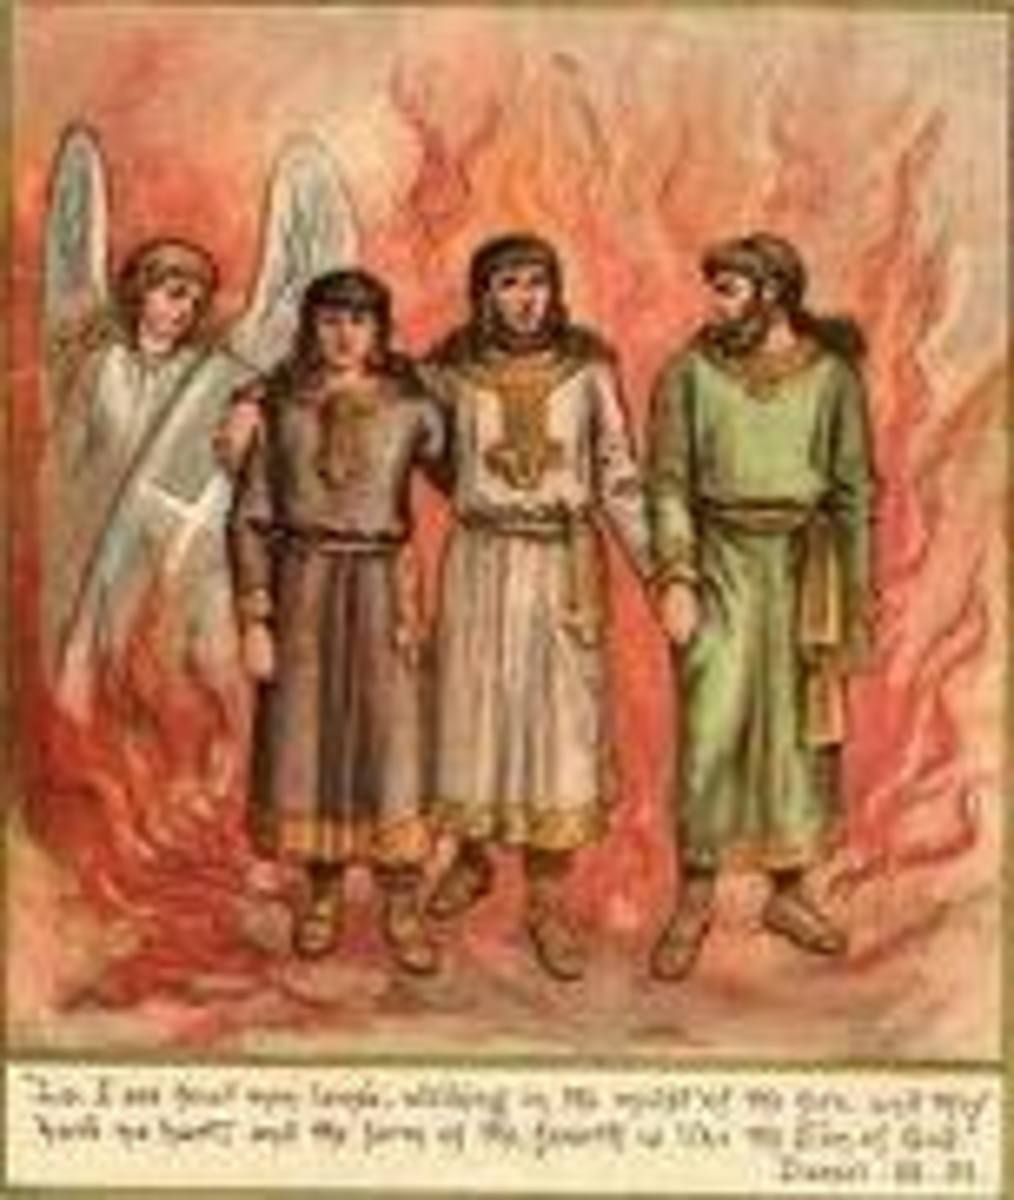 The 3 Hebrew boys & God